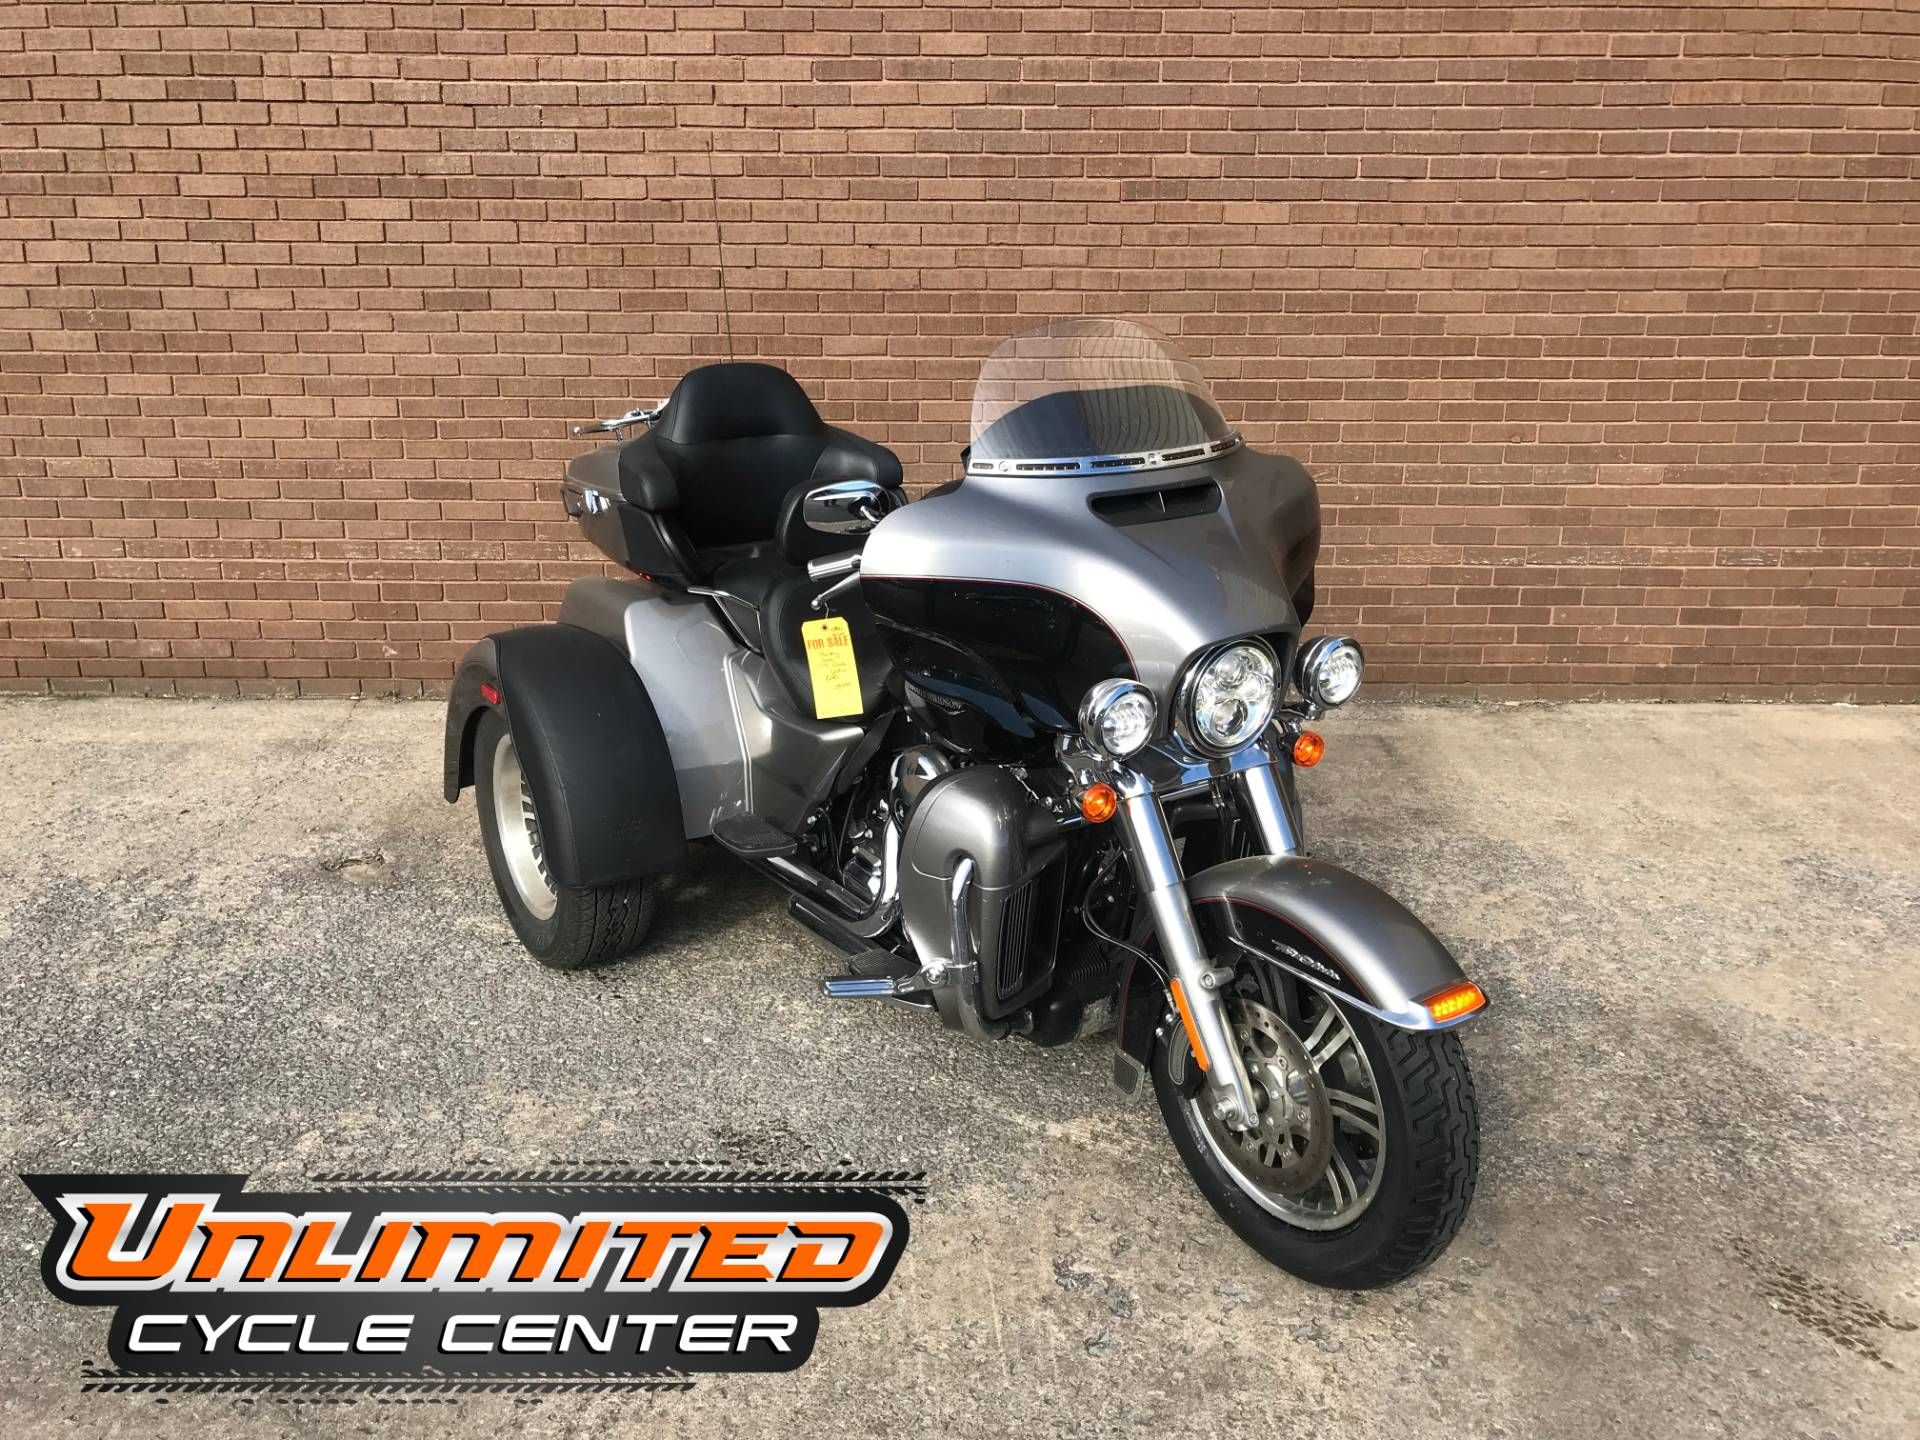 2016 Harley Davidson Trike Tri Glide Ultra Review: 2016 Harley-Davidson Tri Glide® Ultra Trikes Tyrone